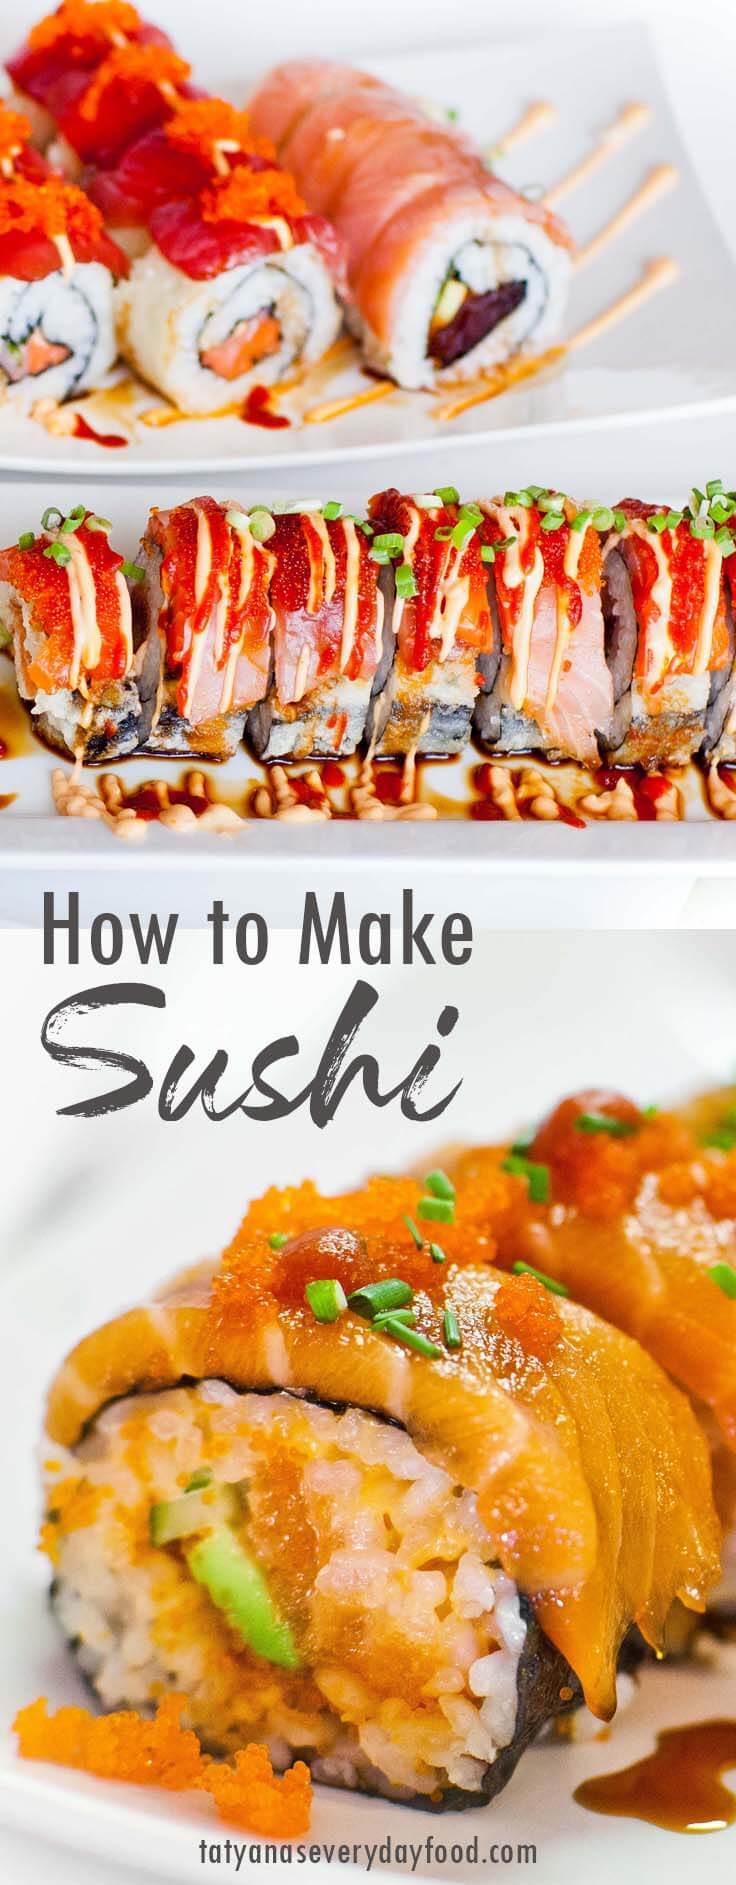 How To Make Sushi video recipe